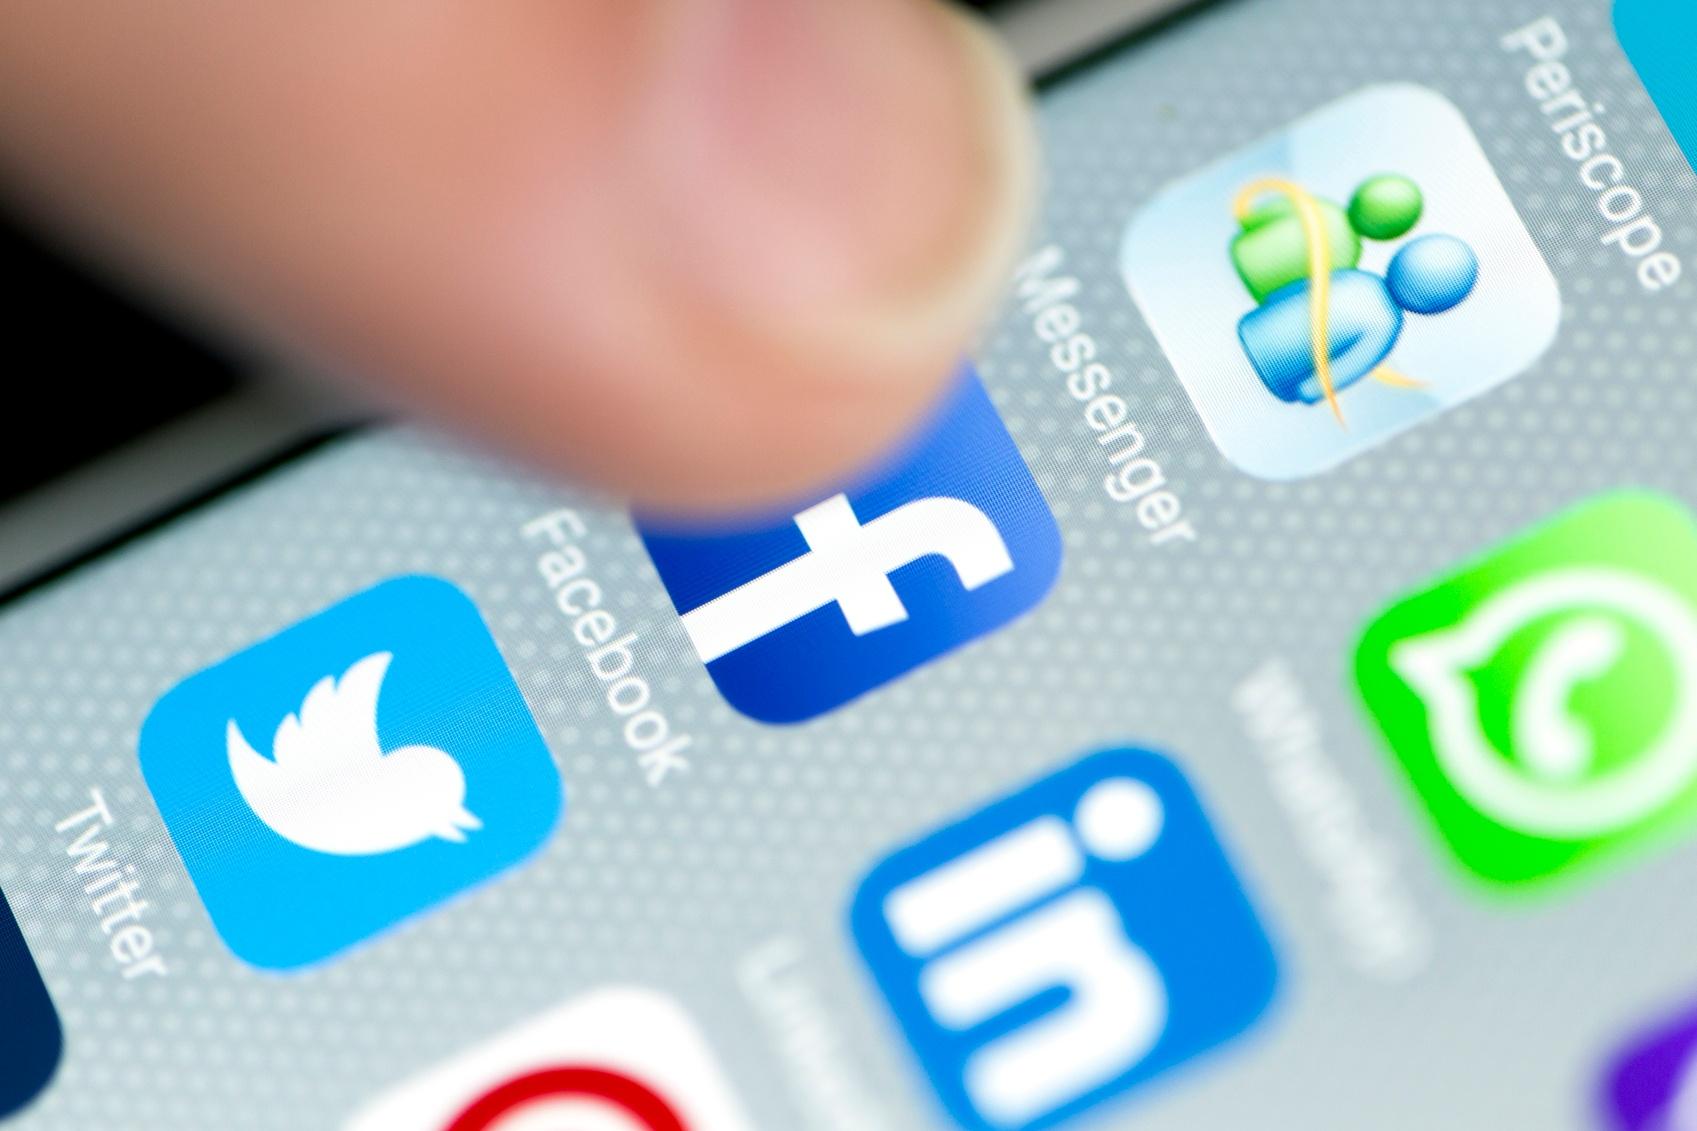 Male-Finger-is-Touching-Facebook-App-on-iPhone-6-Screen-000088471337_Medium.jpg